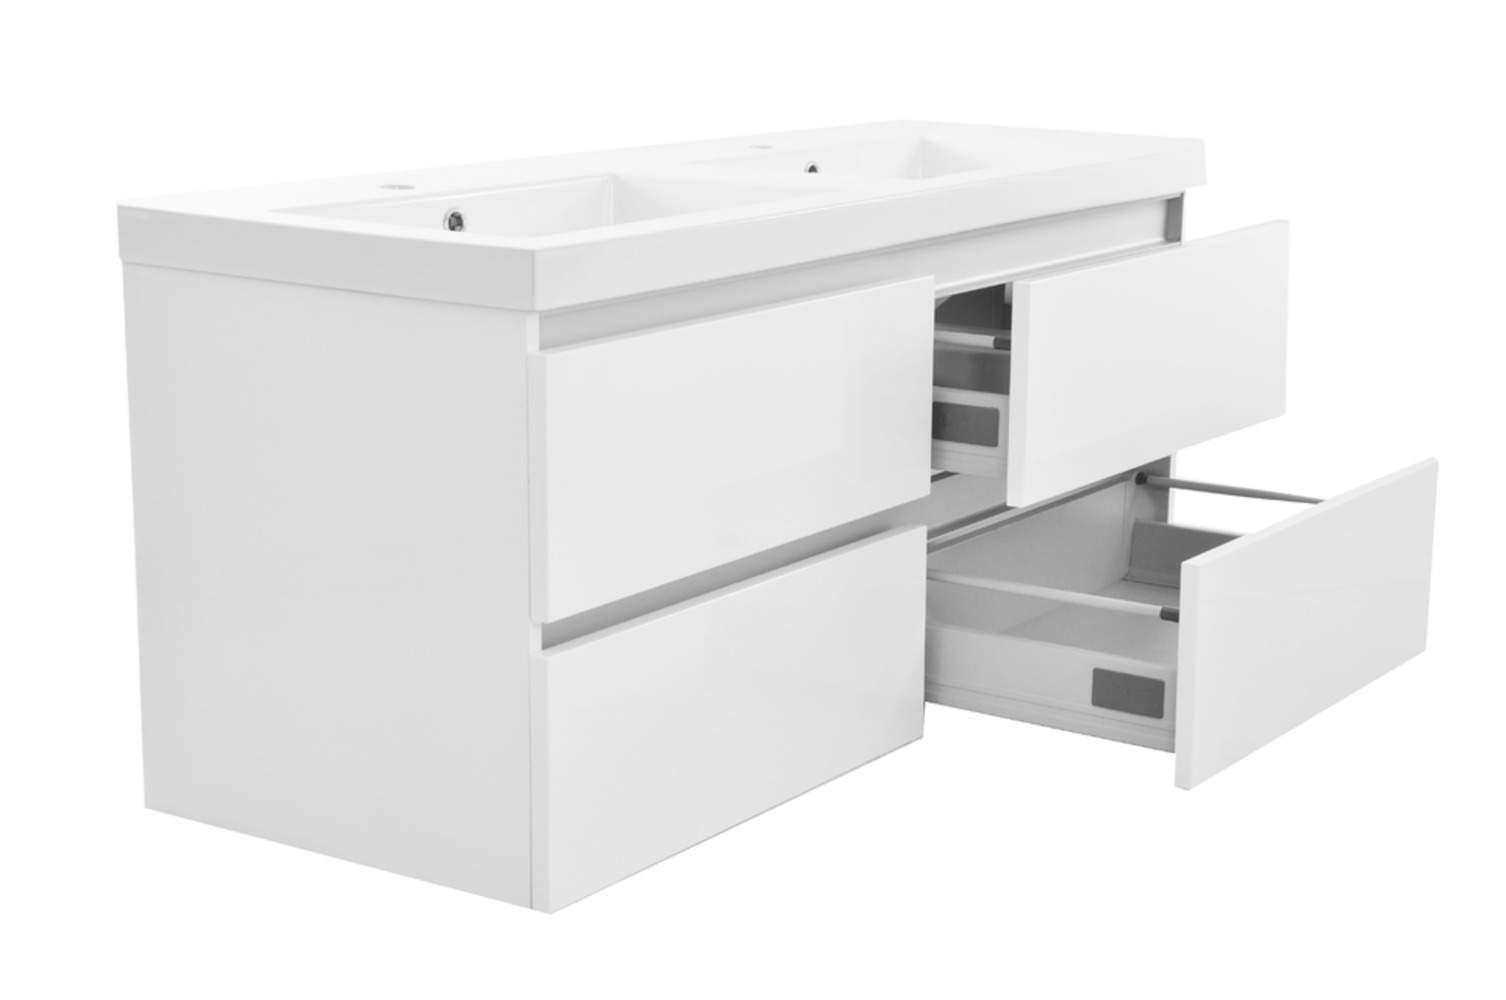 Vision meubel keramische dubbele wastafel wit megadump